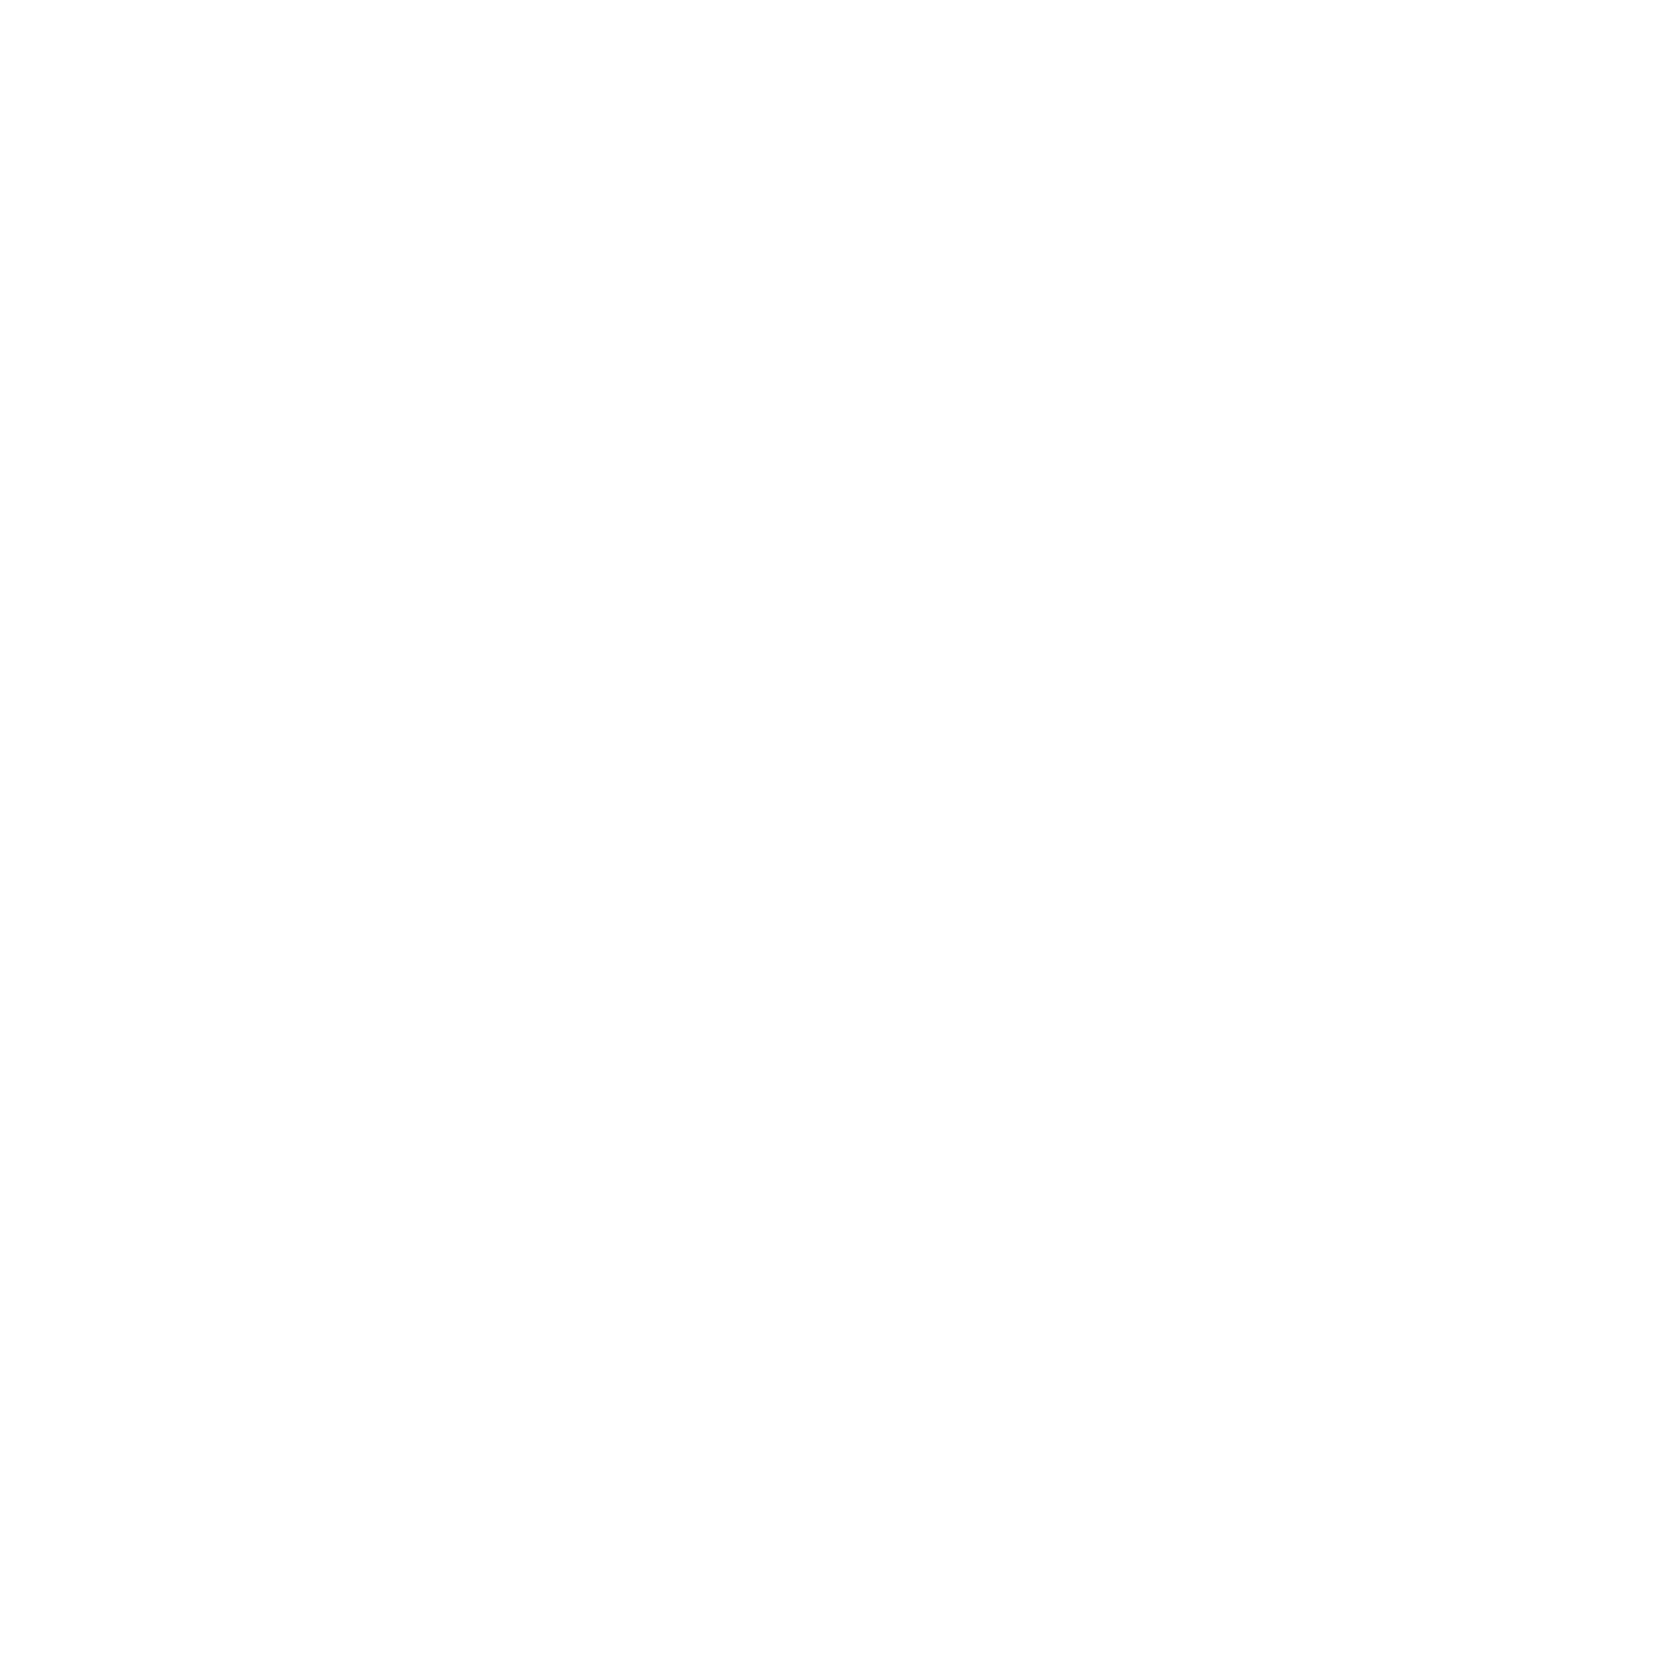 Kellogg College MCR